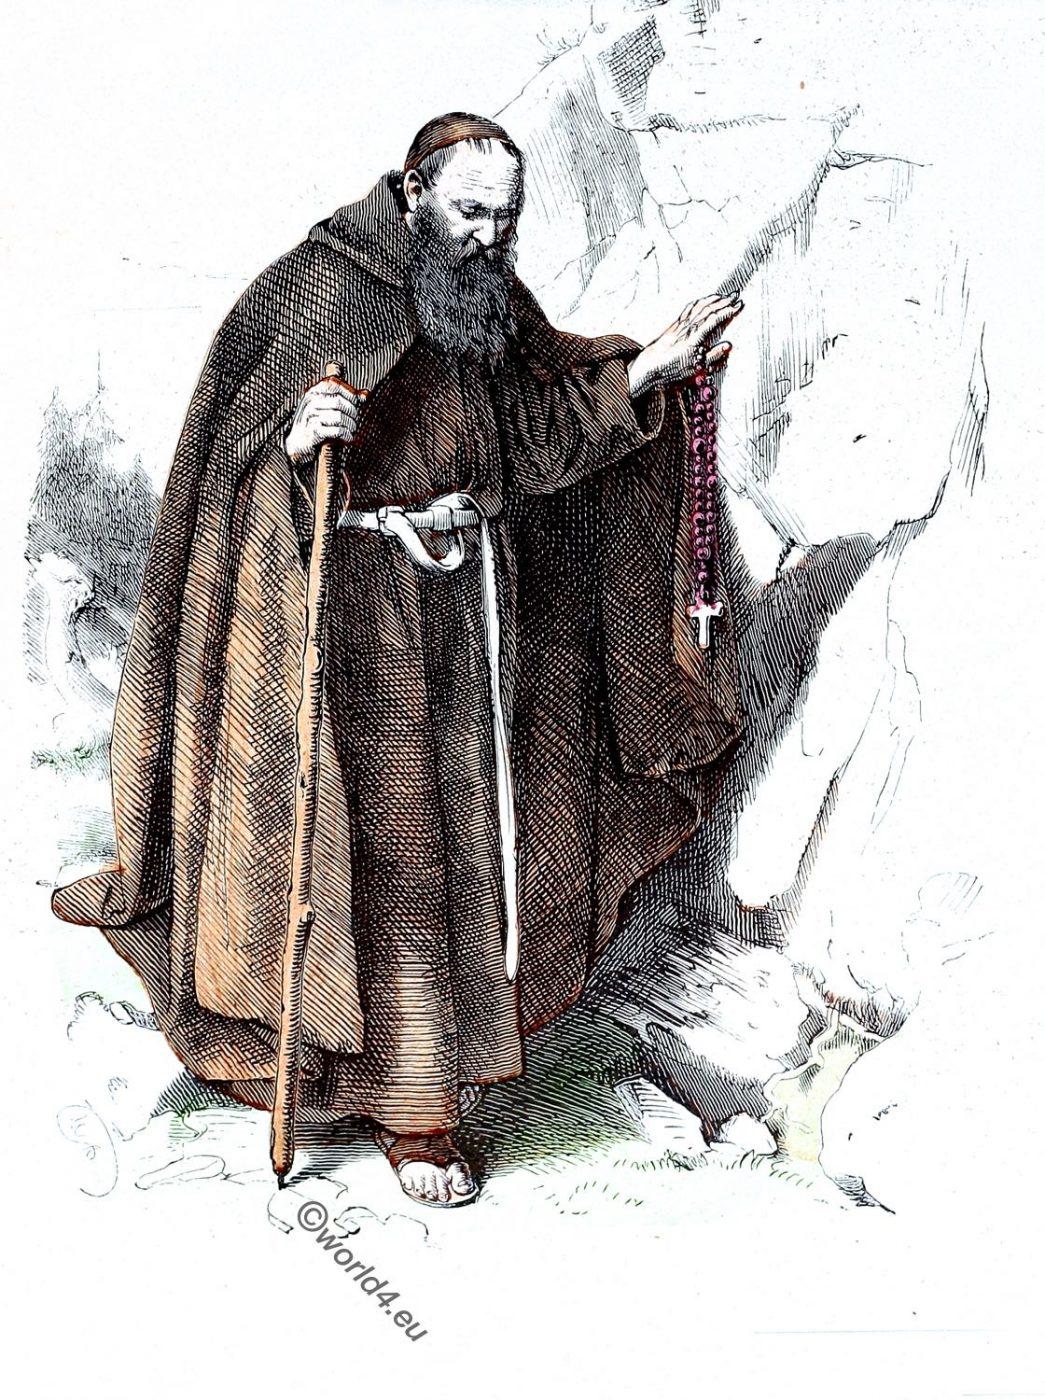 Hieronymites, hermit, monks, Ecclesiastical habit, religious order